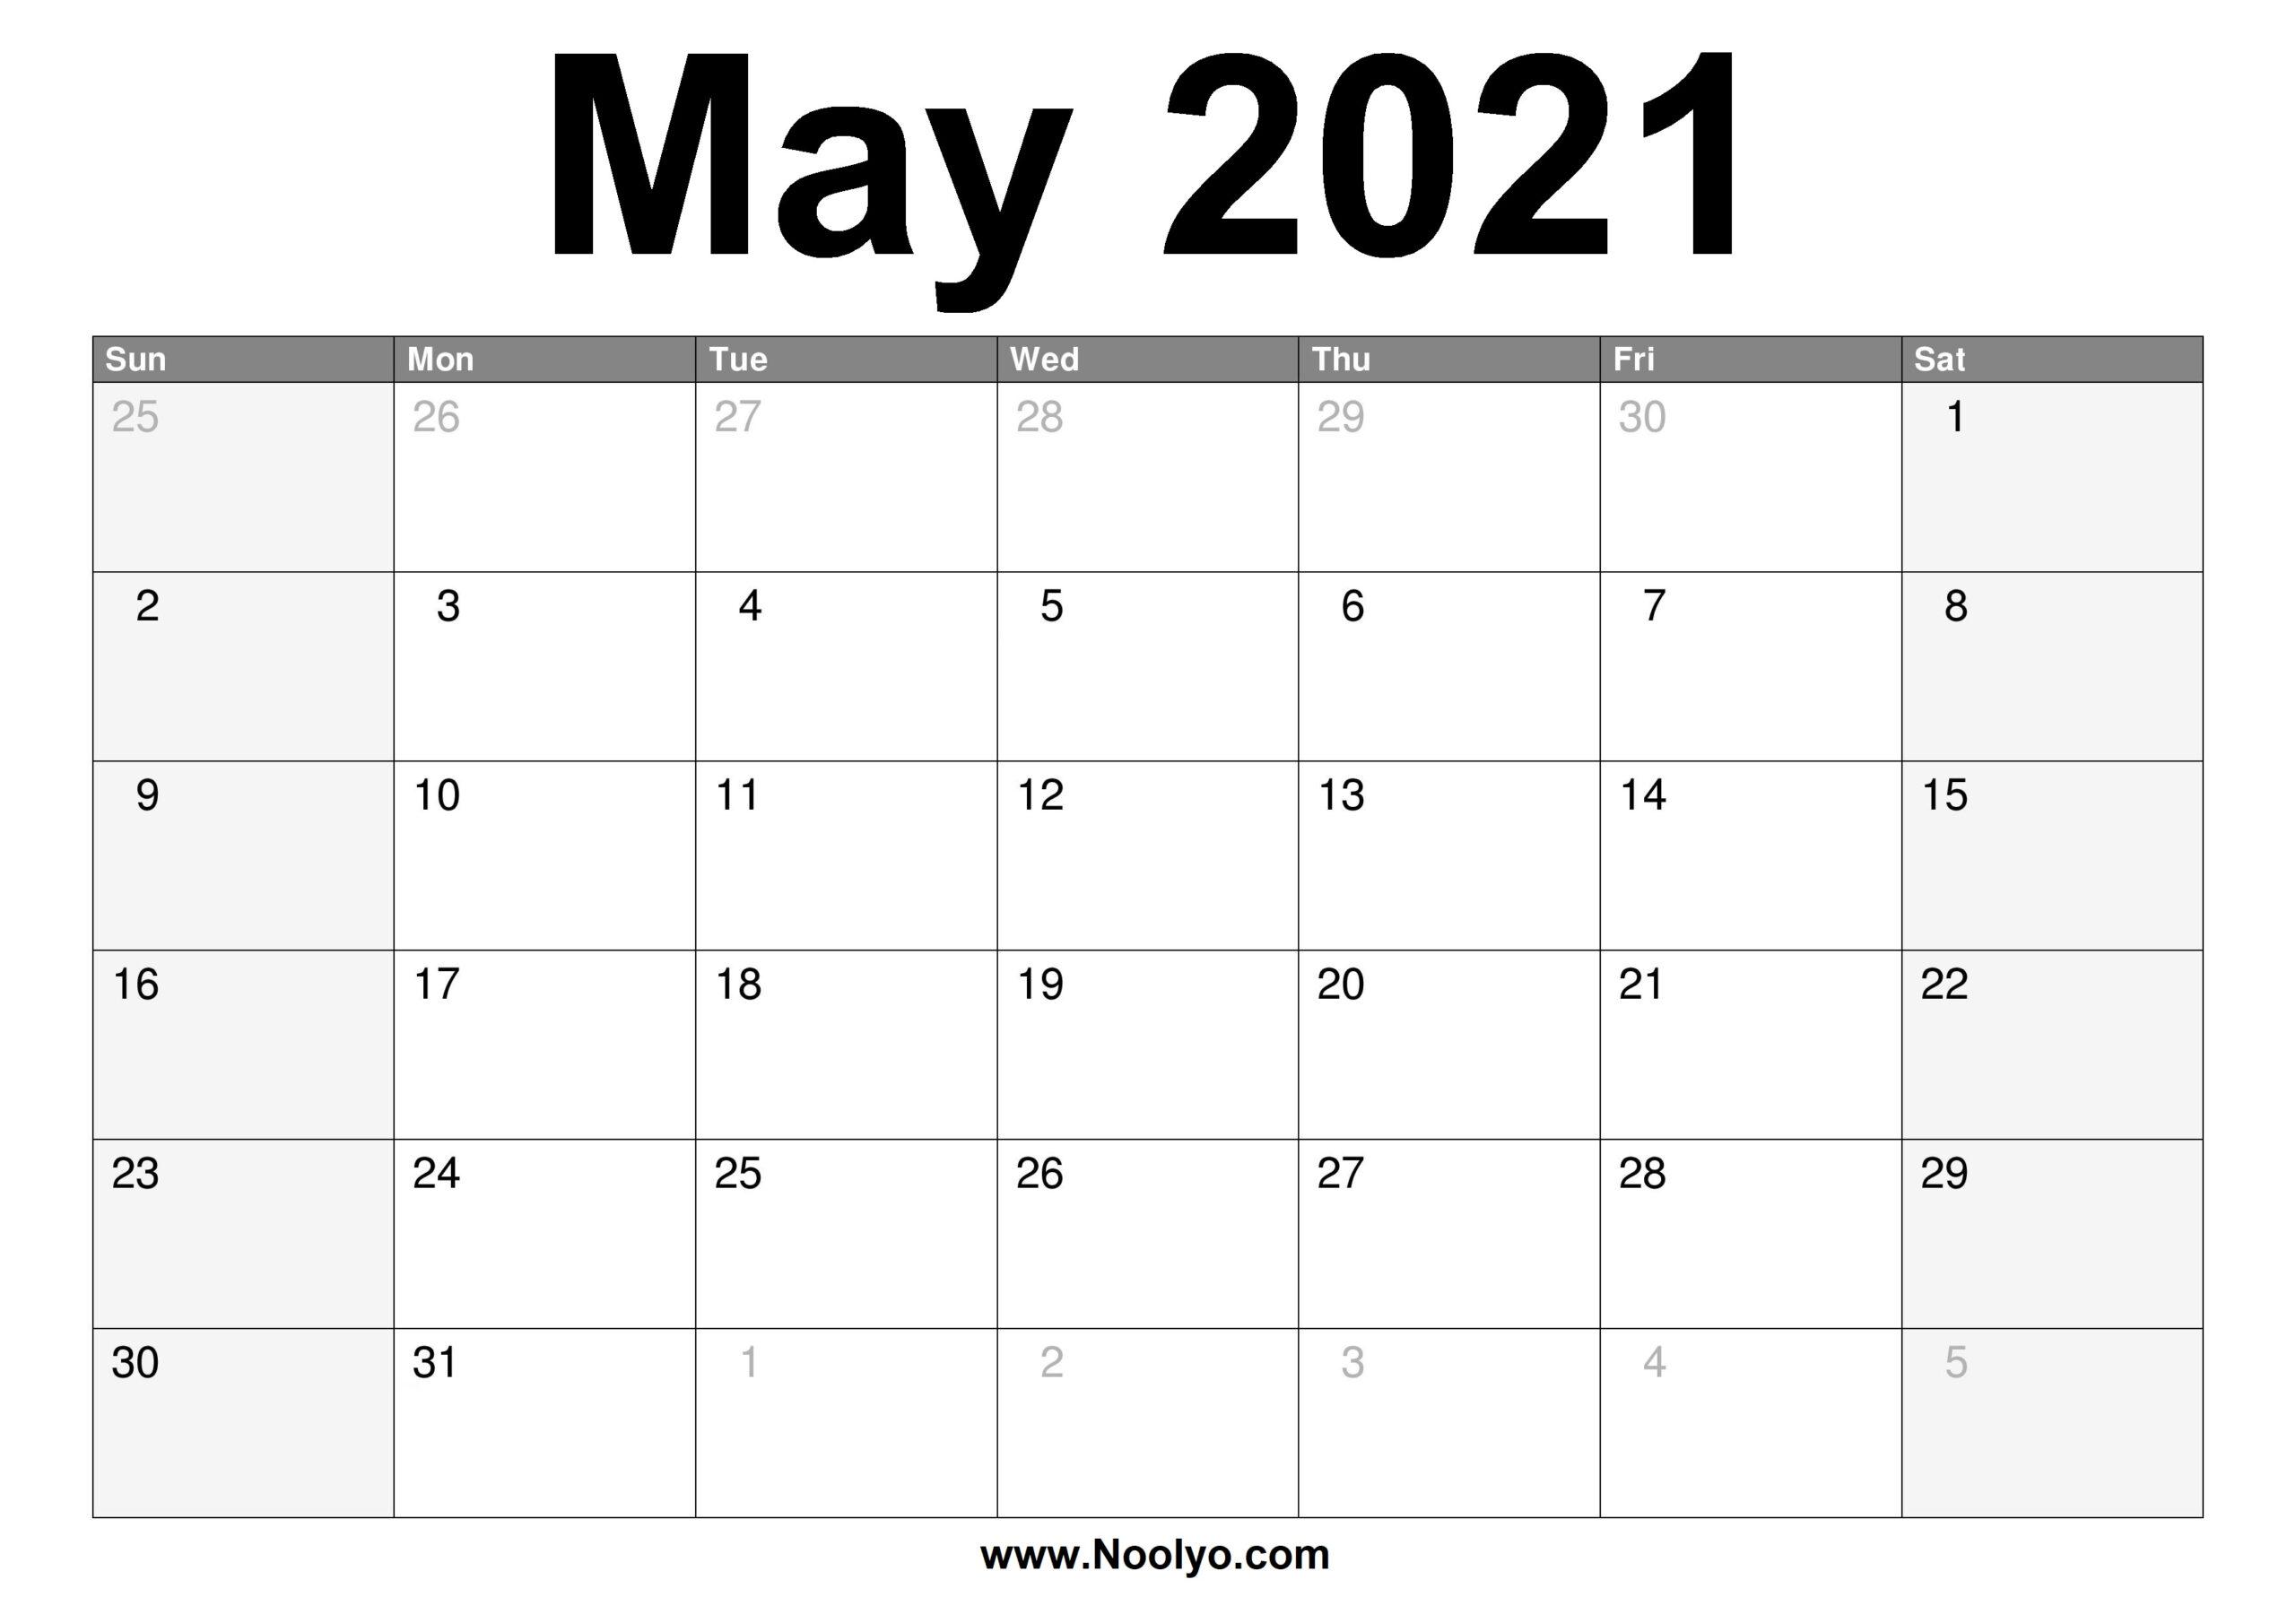 May 2021 Calendar Printable – Free Download – Noolyo